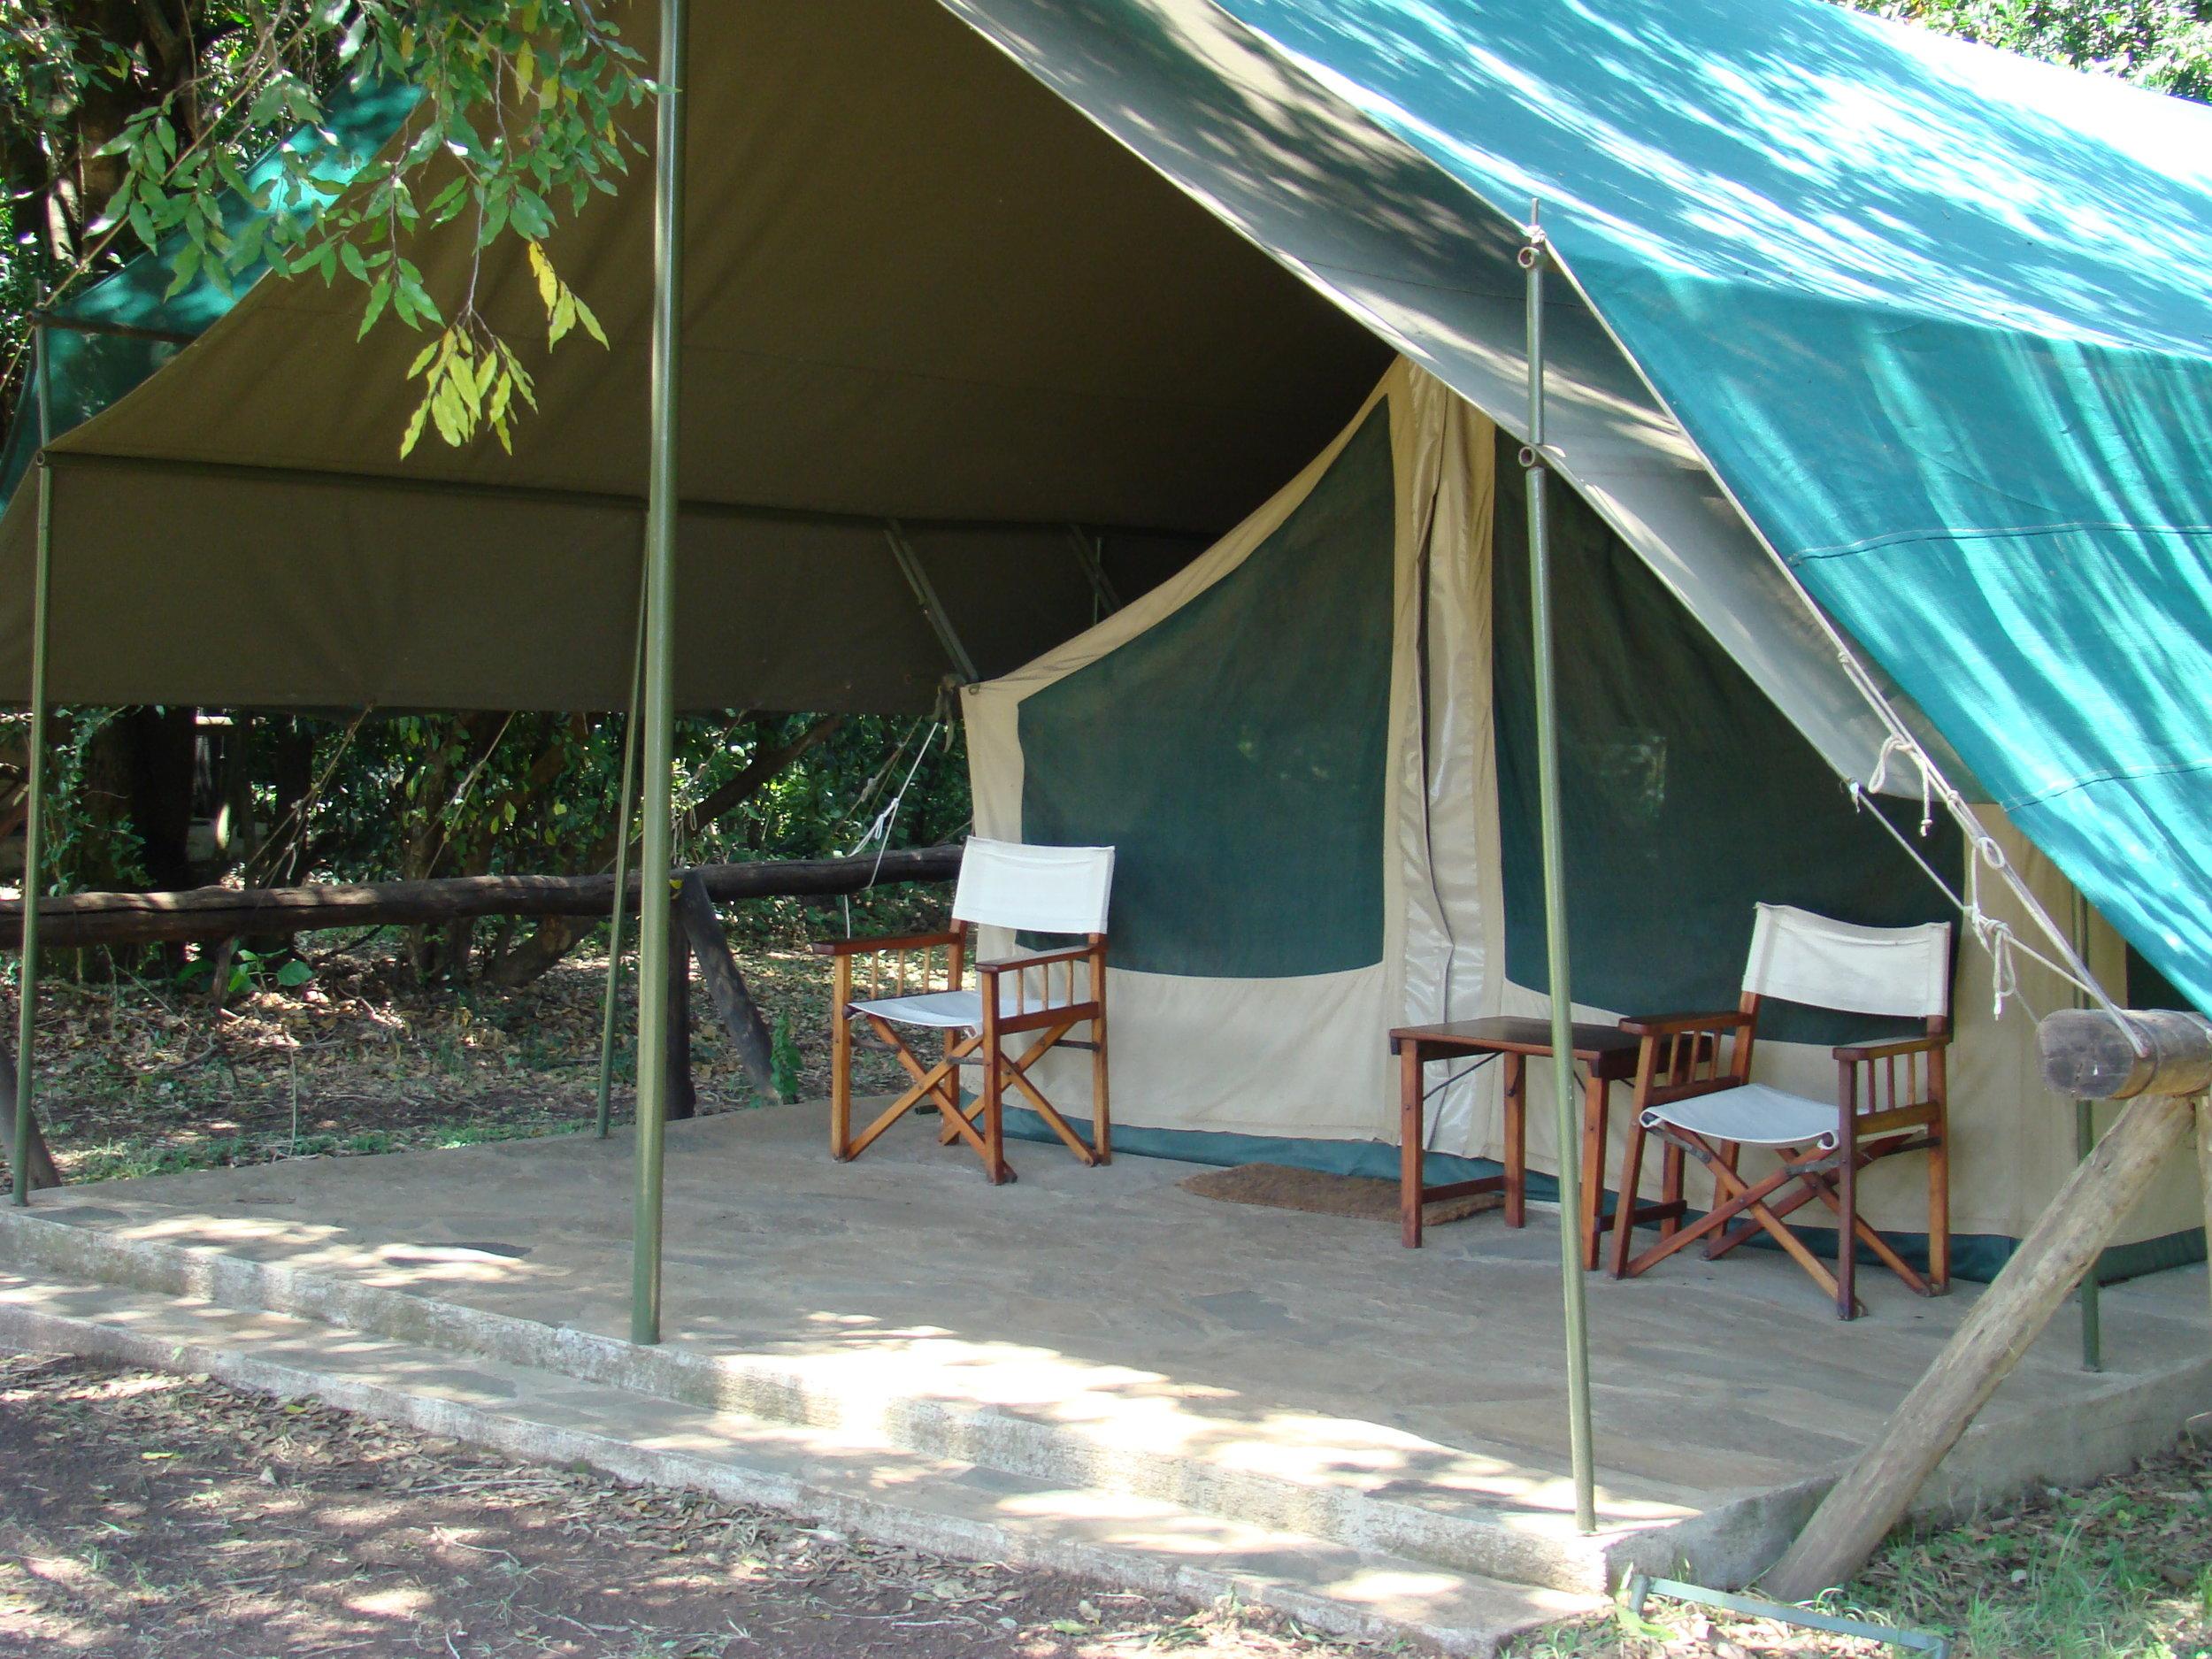 Govenors Main Camp